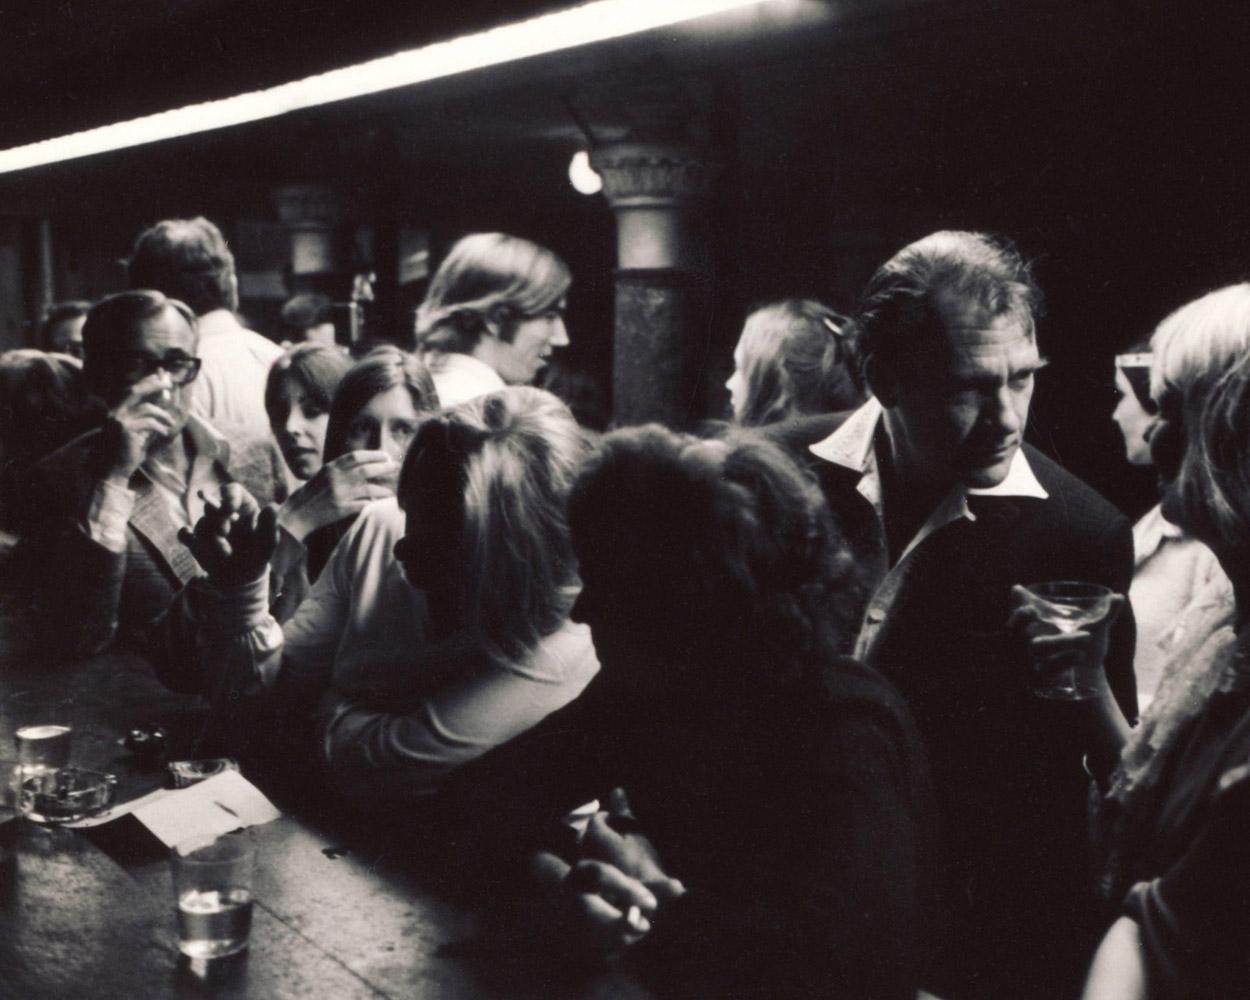 Opening Night 1970